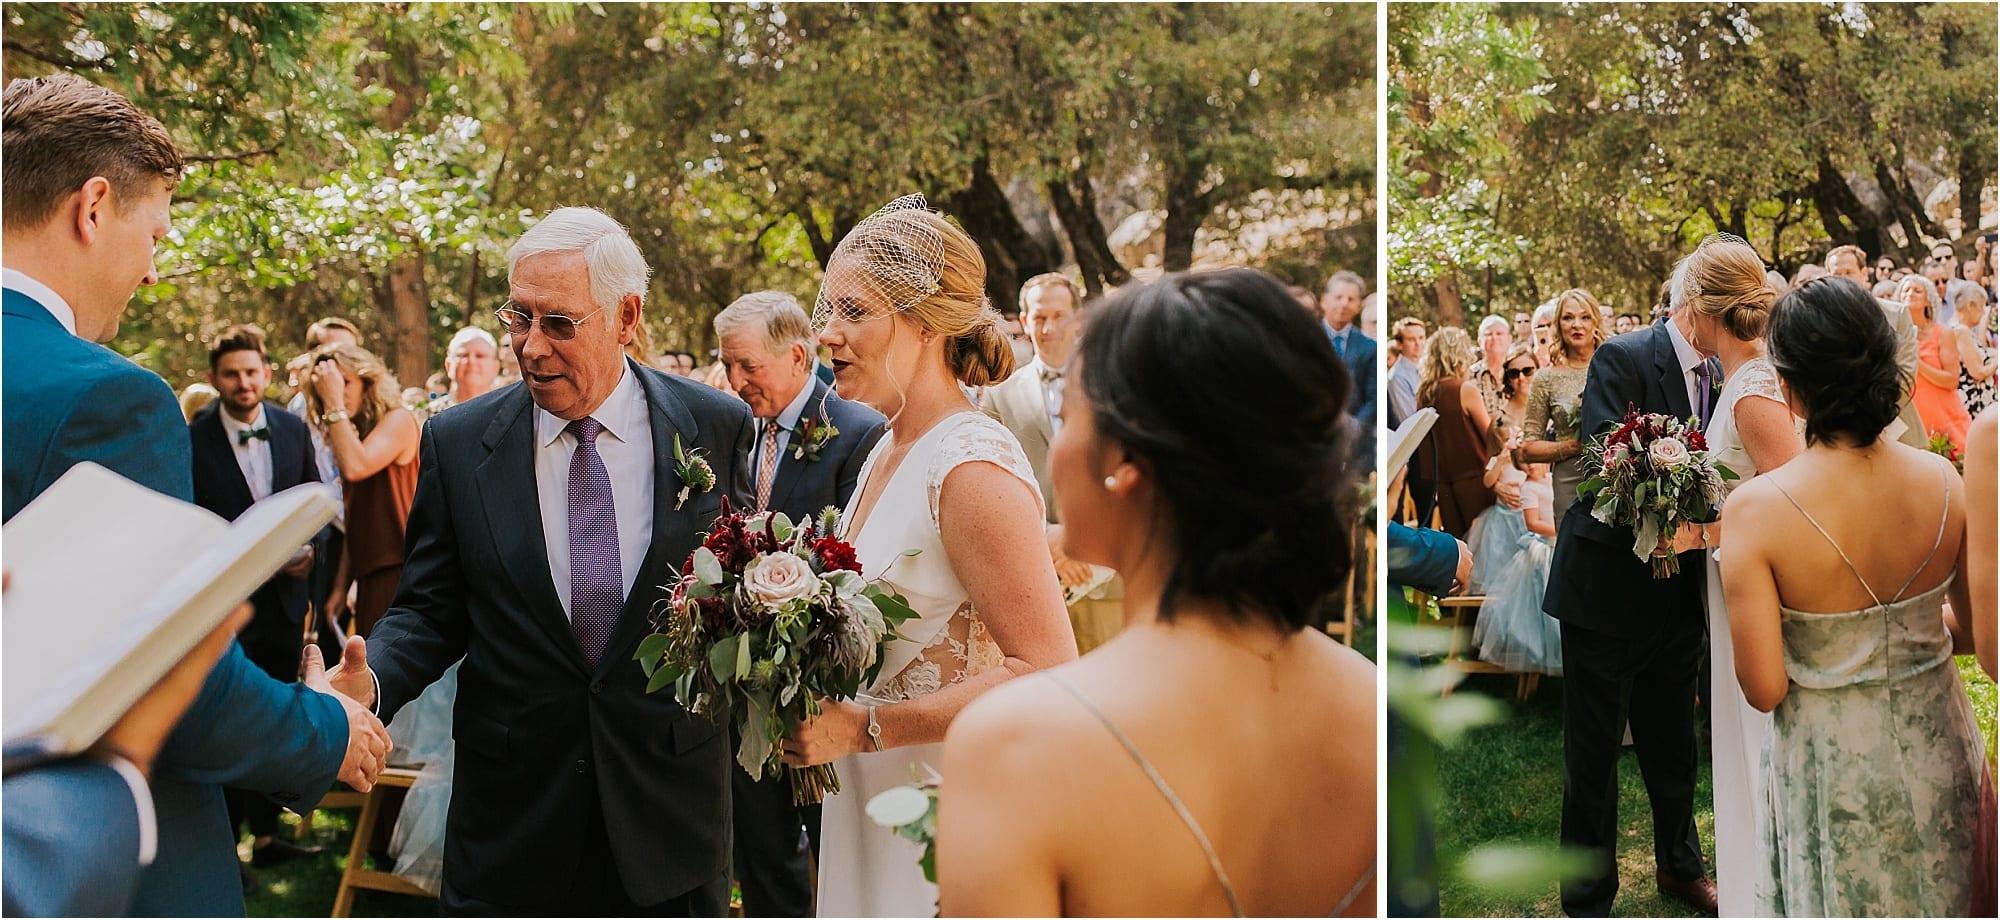 bride and father walk down aisle in Evergreen Colorado outdoor wedding ceremony